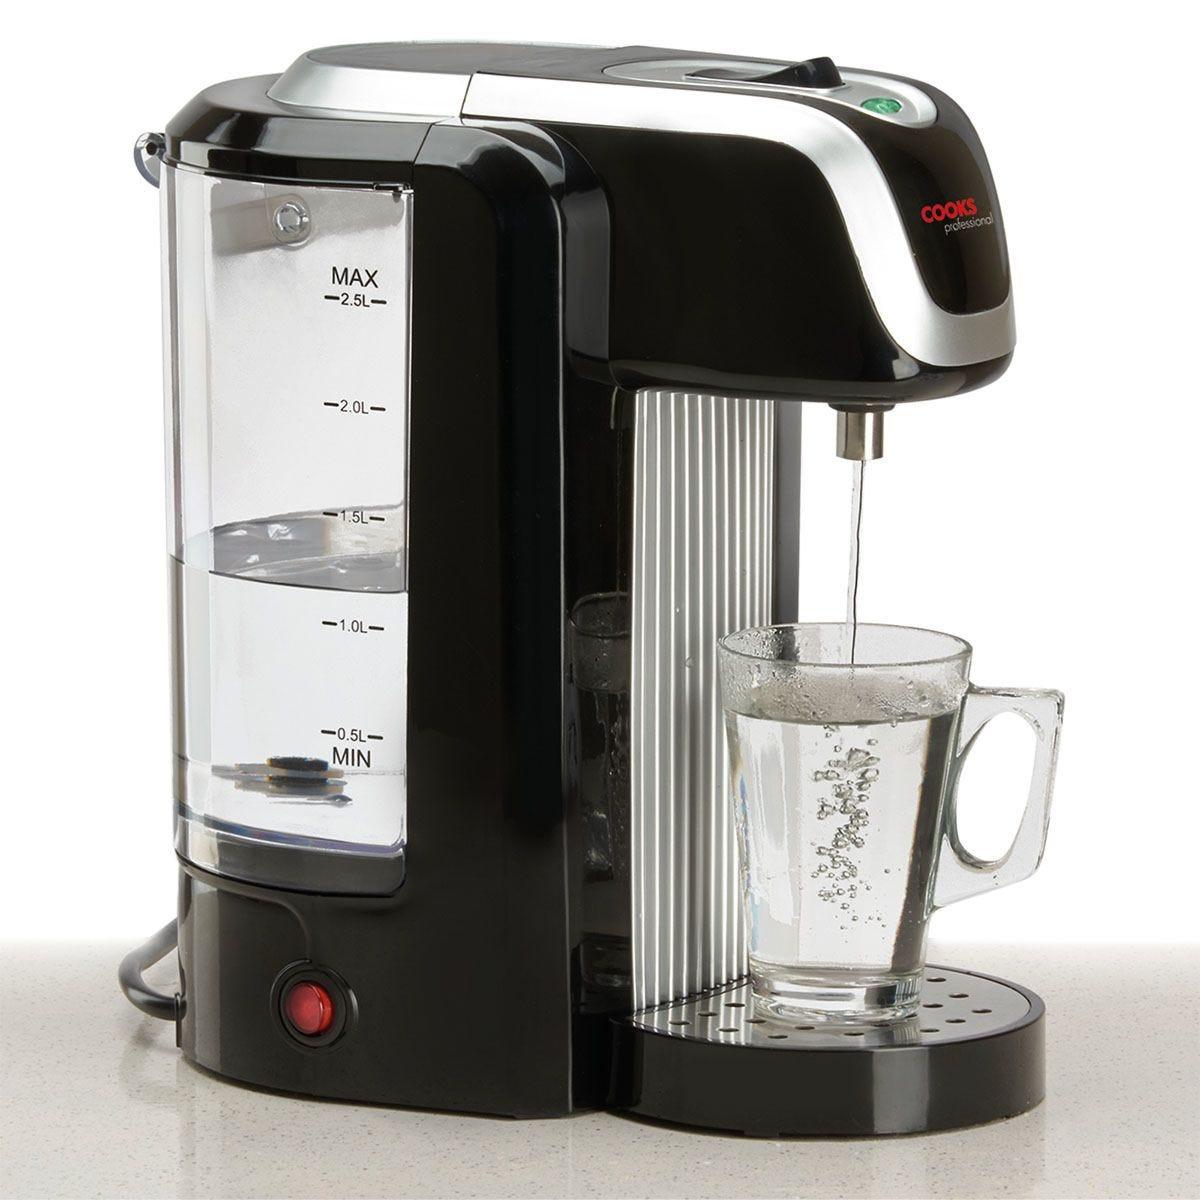 Cooks Professional Hot Water Dispenser - Black